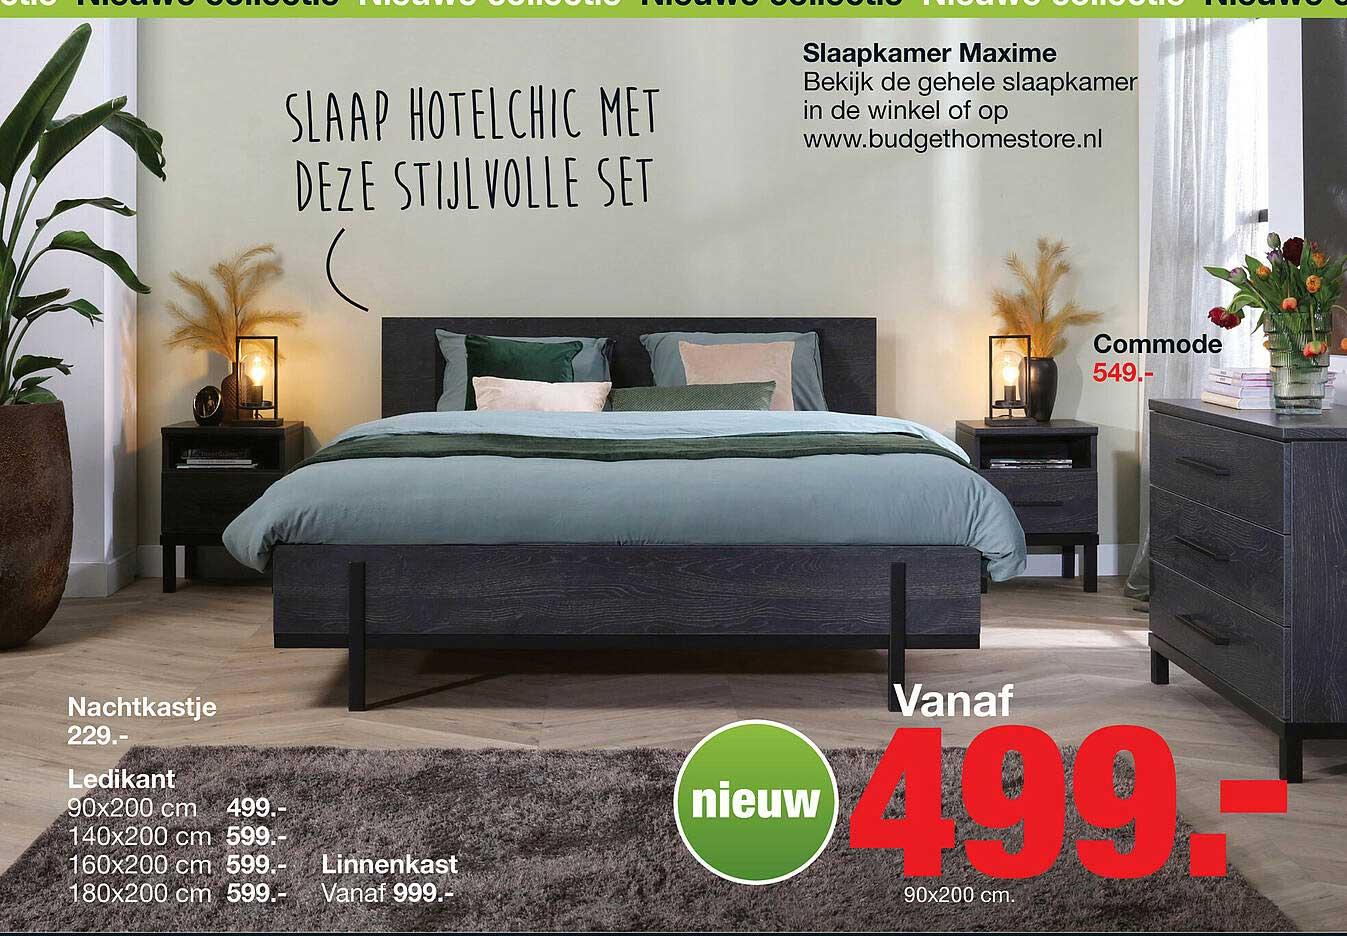 Budget Home Store Slaapkamer Maxime Nachtkastje, Commode